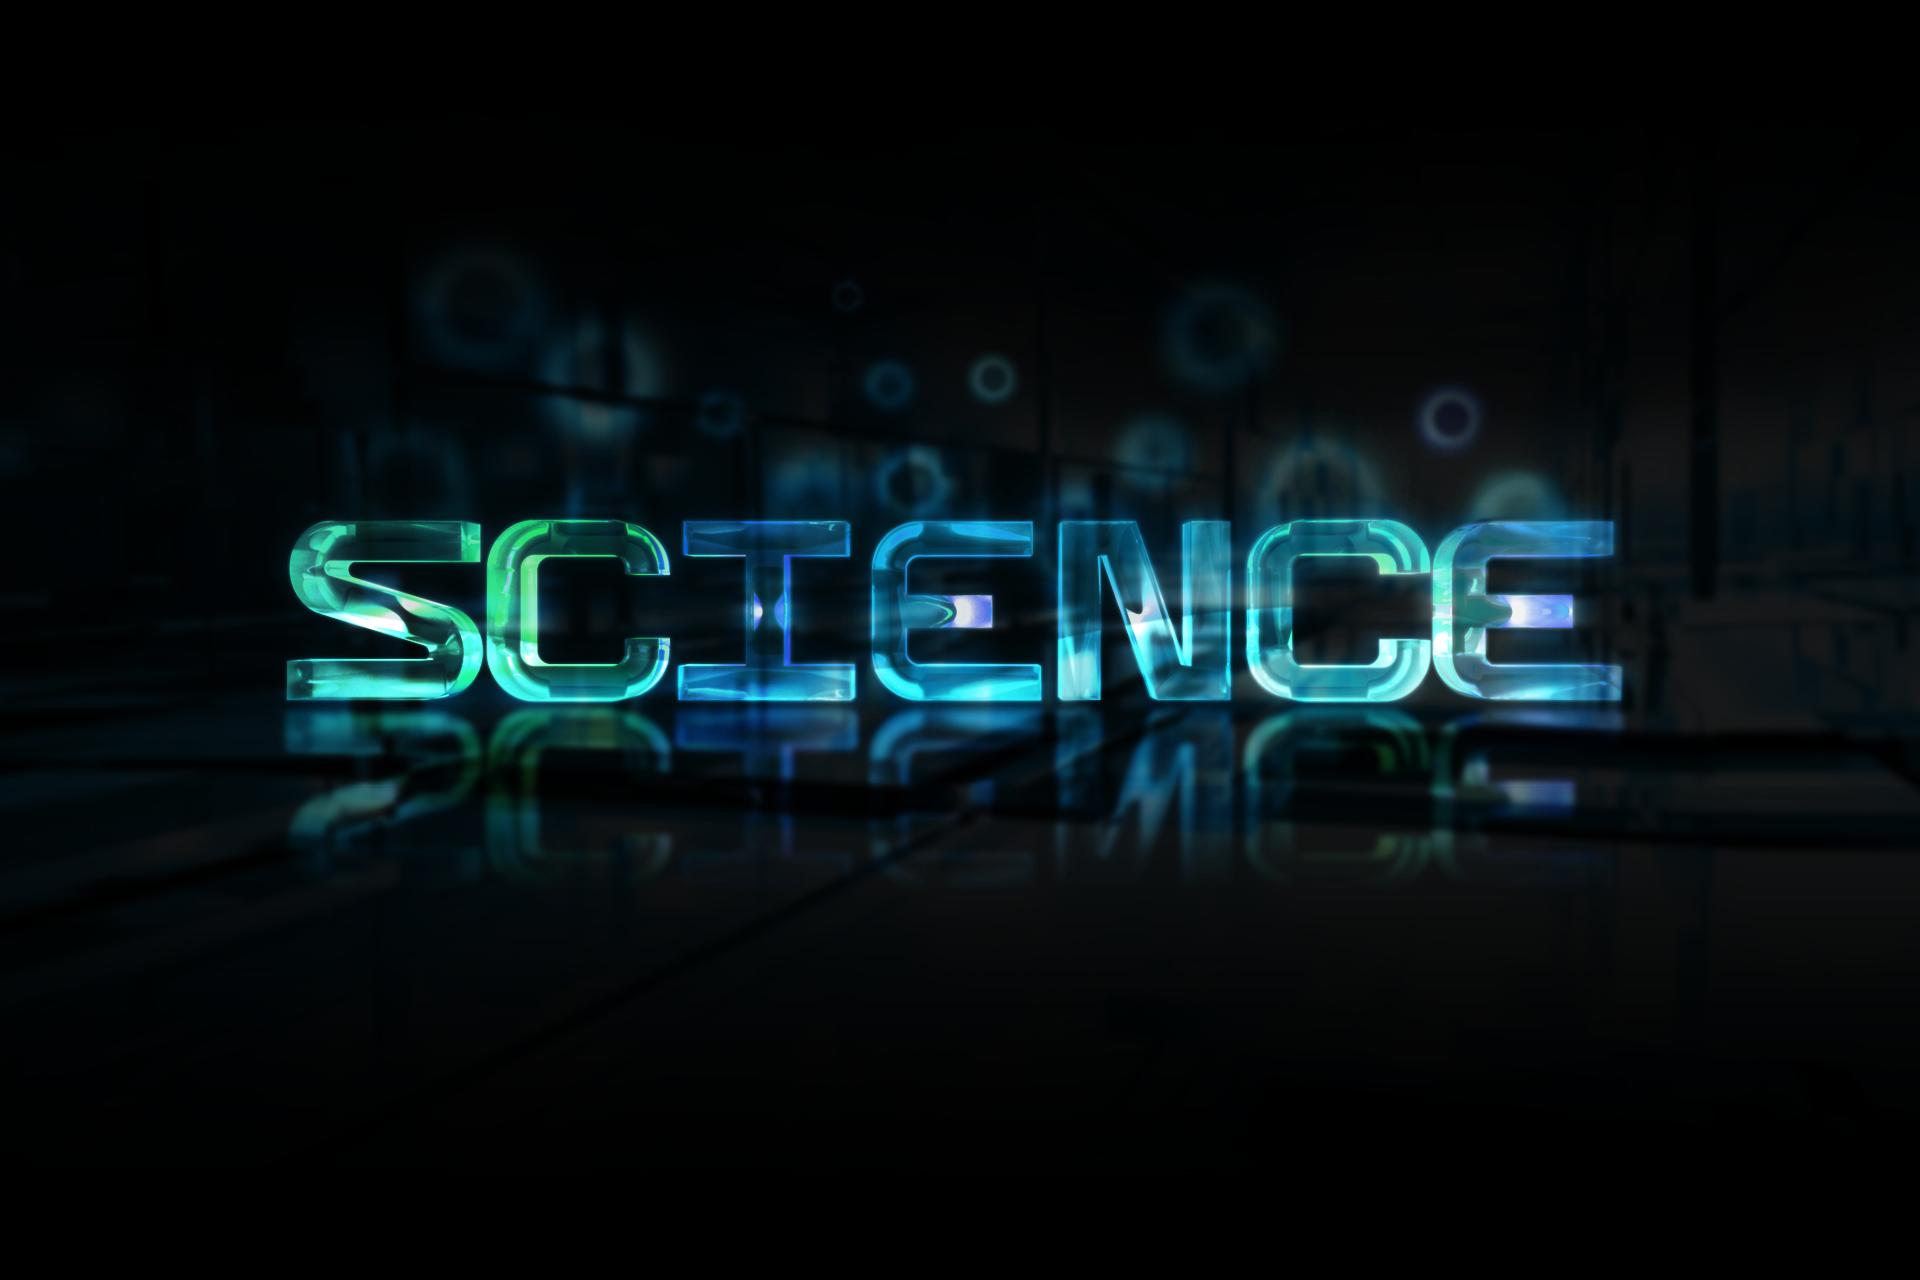 1920 x 1280 png 868kBScience